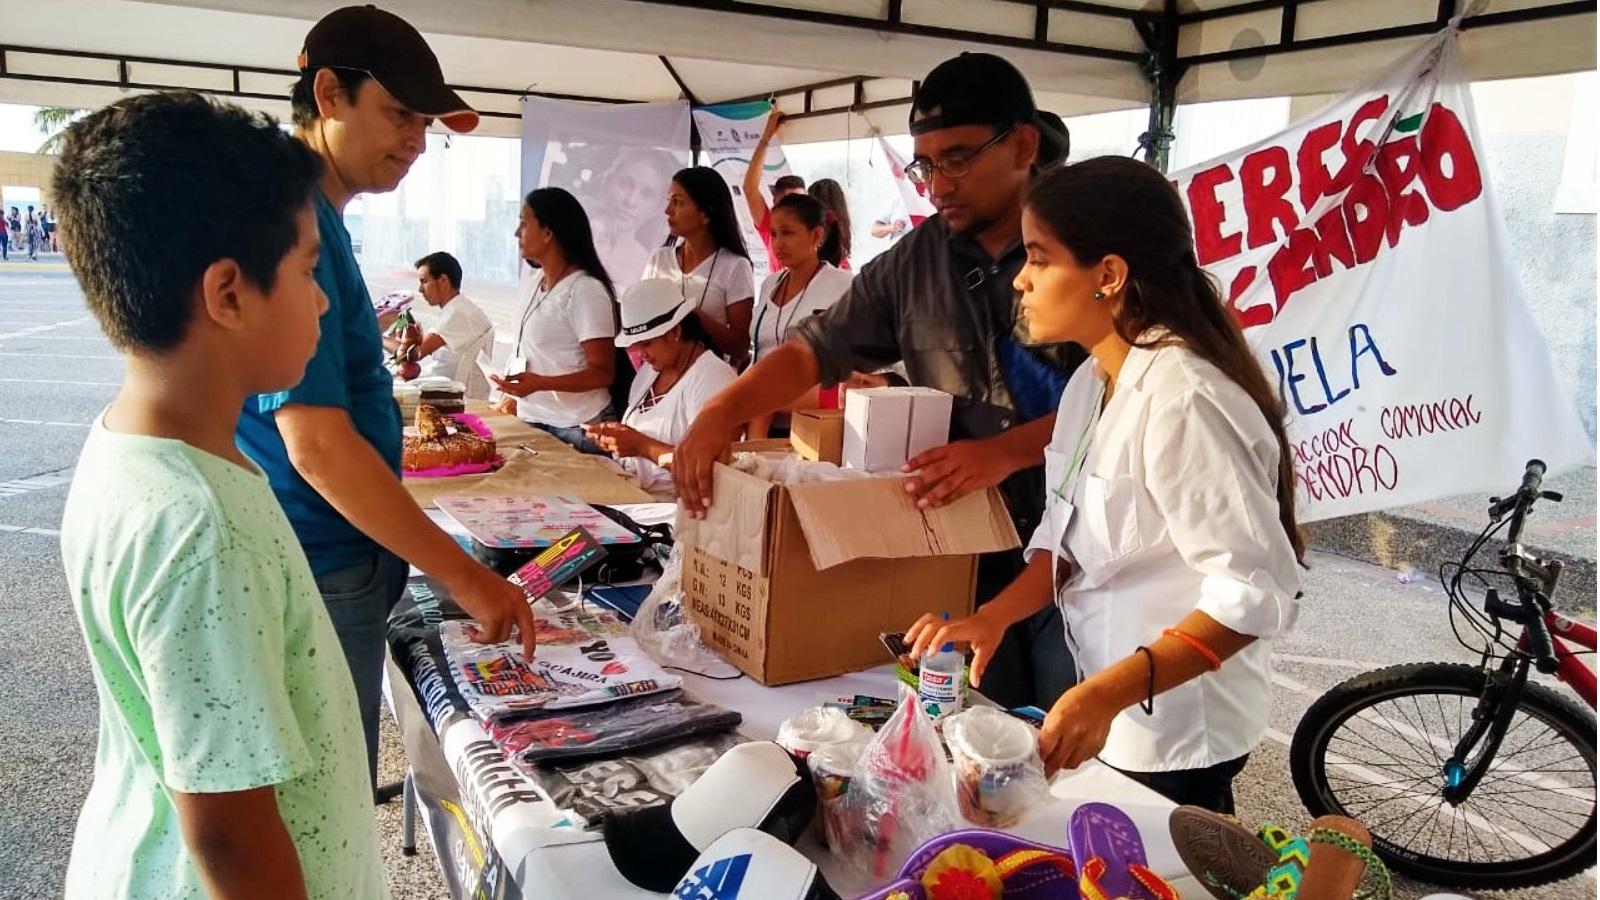 Emprendedores venezolanos podrán acceder a créditos en Colombia